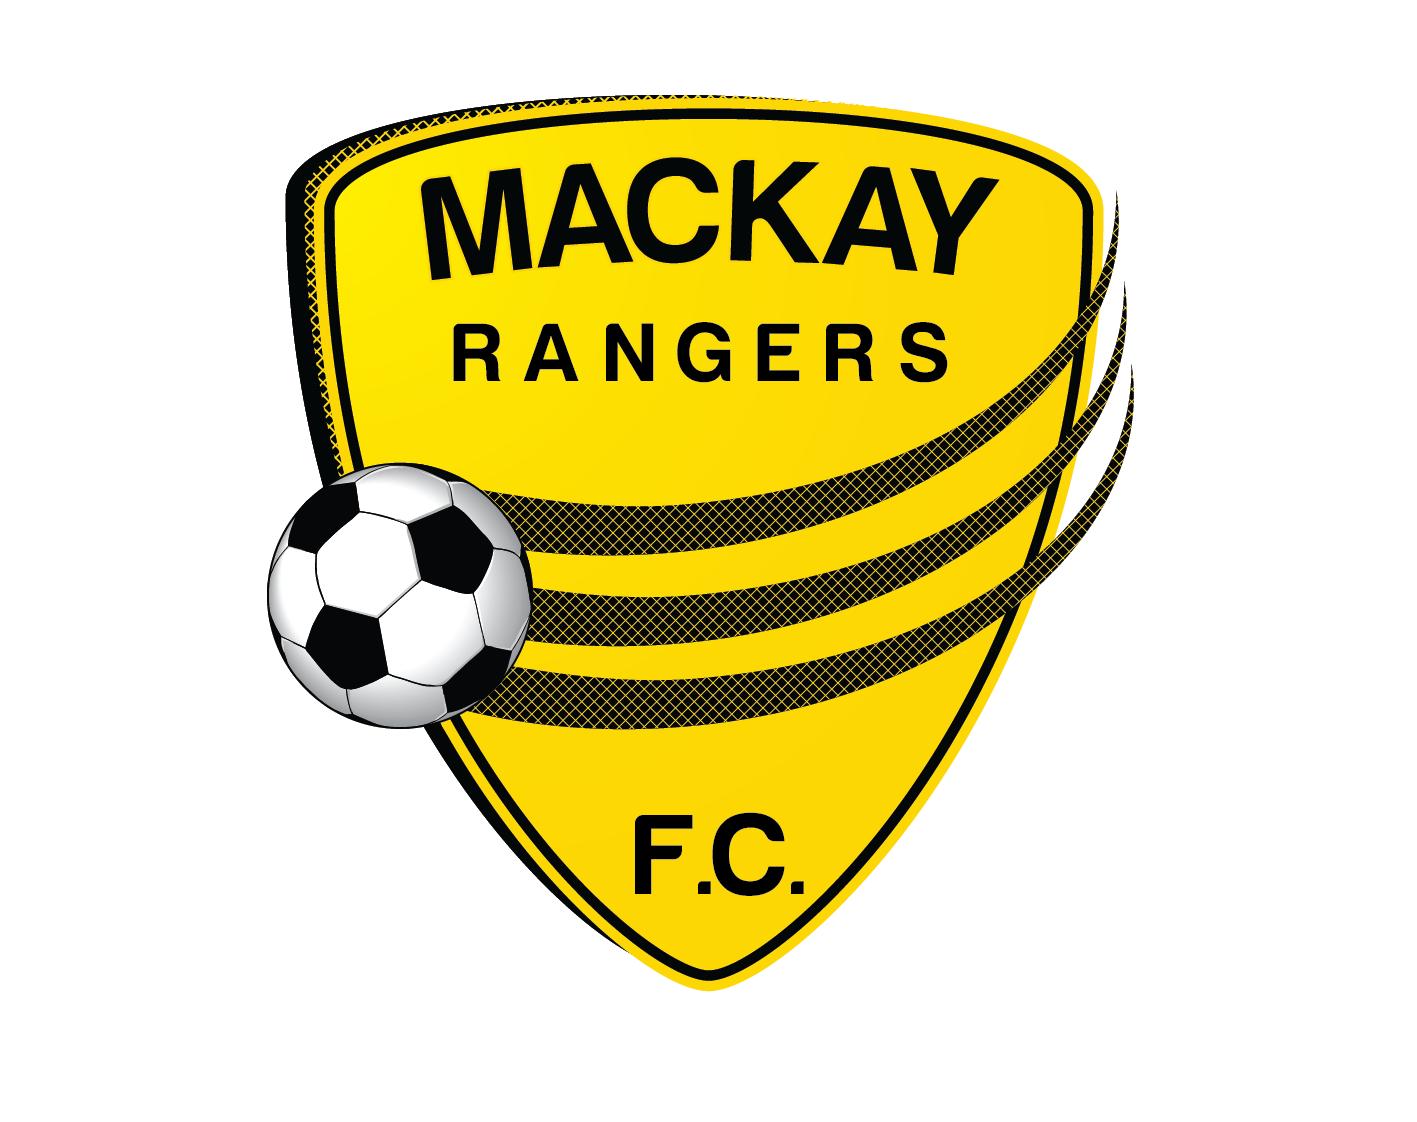 Modern masculine logo design for aaron pirie by dwross design logo design by dwross for football club logo design 242446 buycottarizona